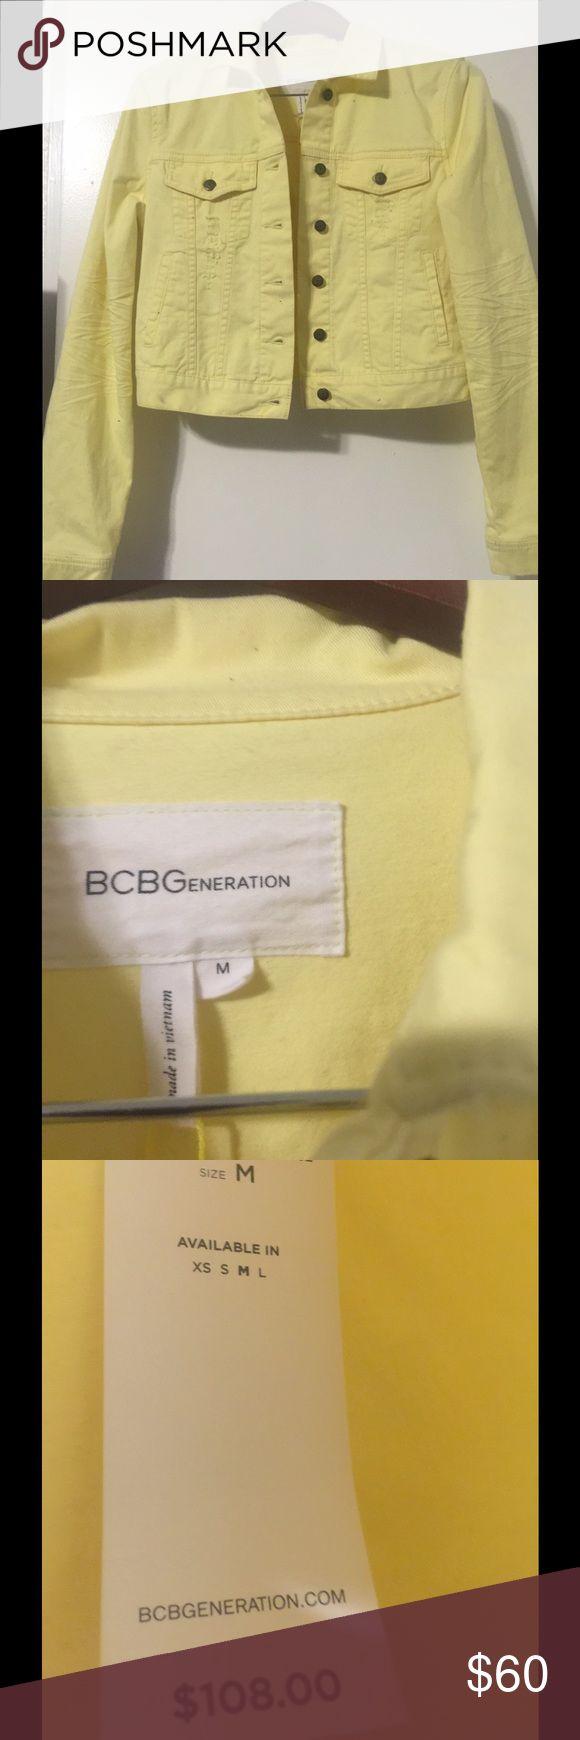 Yellow jacket Yellow bcbg jacket with a little mark on sleeve BCBGeneration Jackets & Coats Jean Jackets